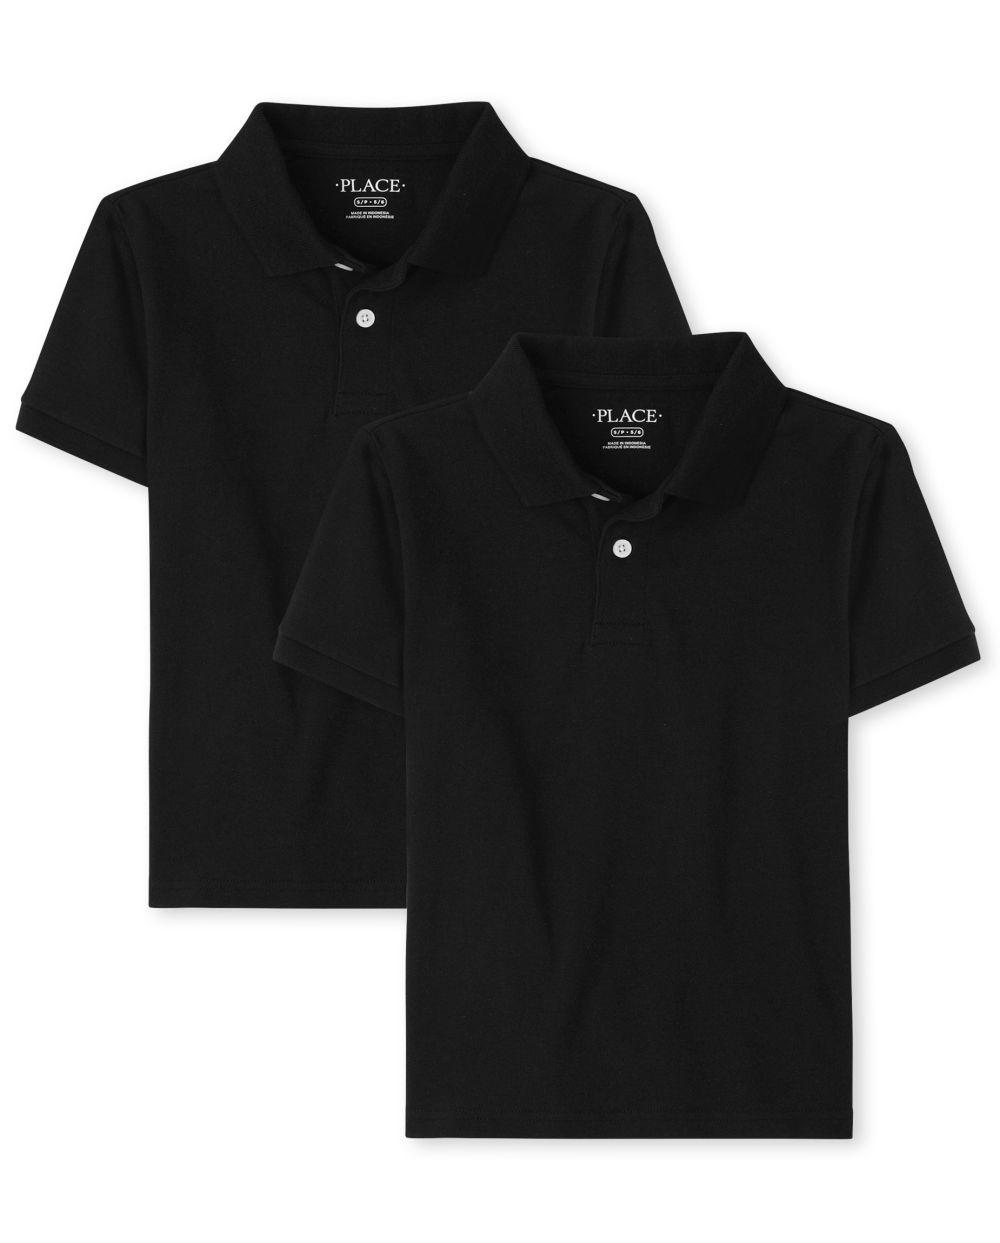 Boys Uniform Pique Polo 2-Pack